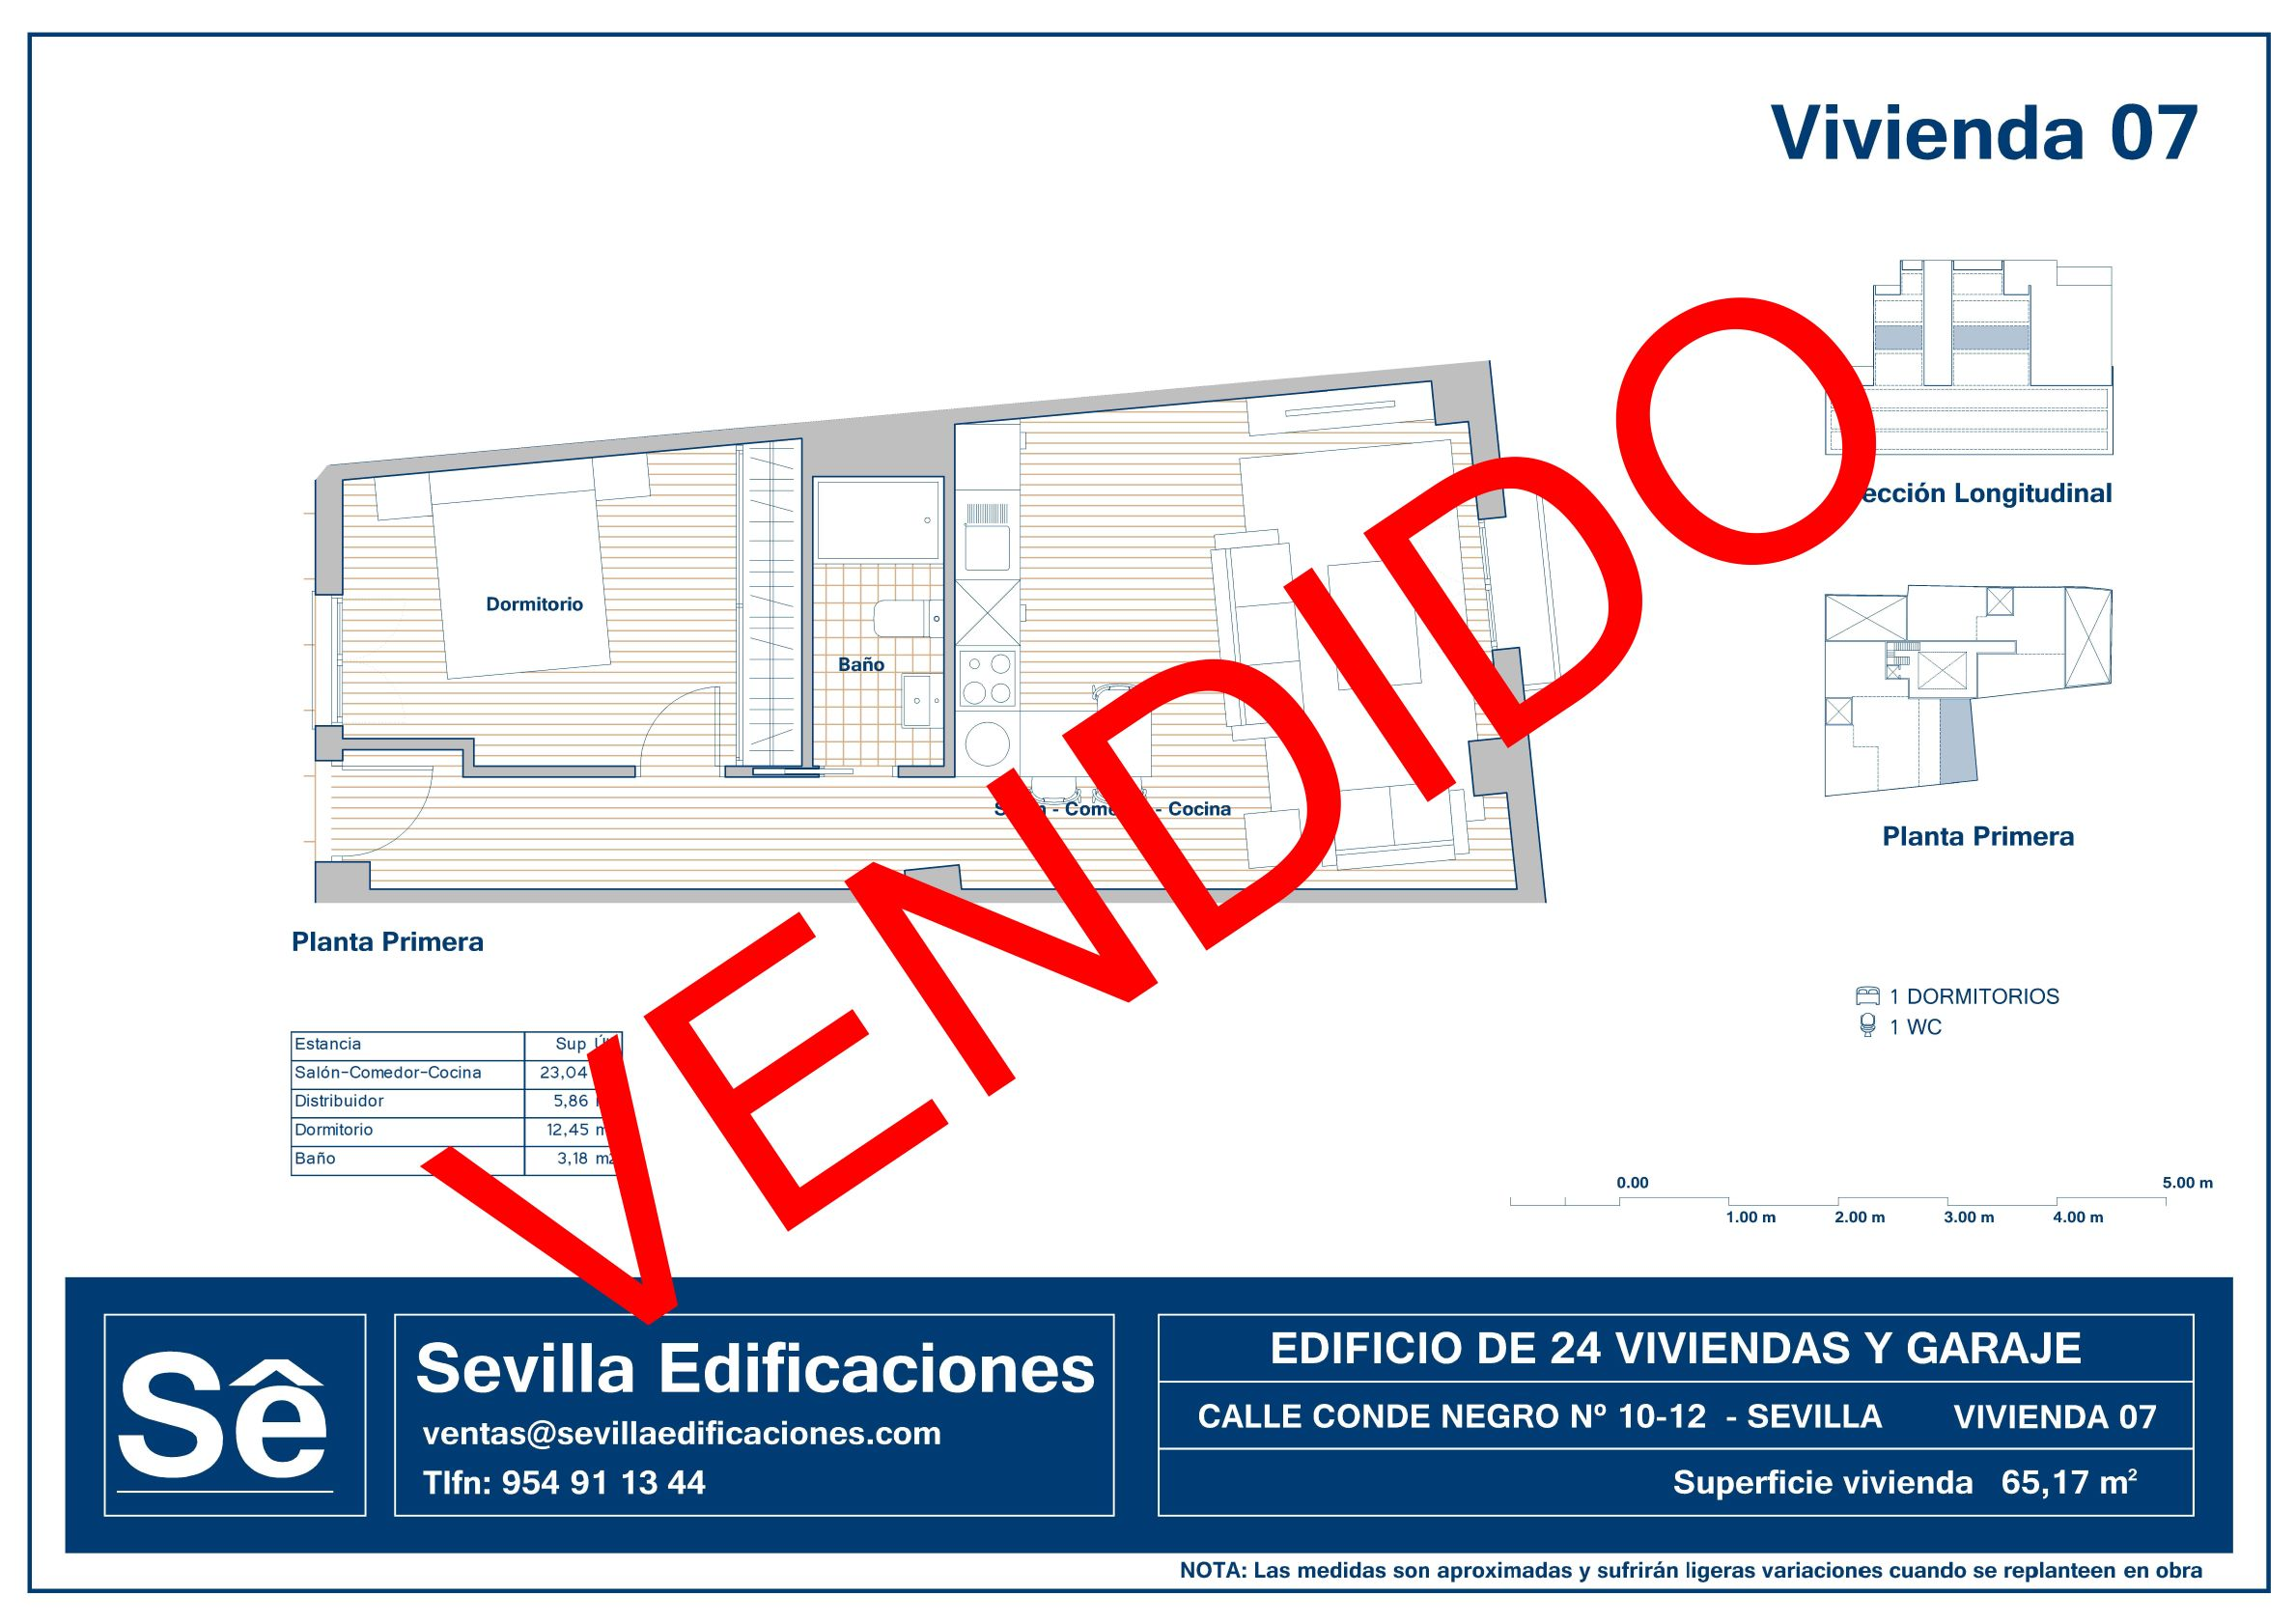 CONDENEGRO_VIVIENDA_07_VENDIDO